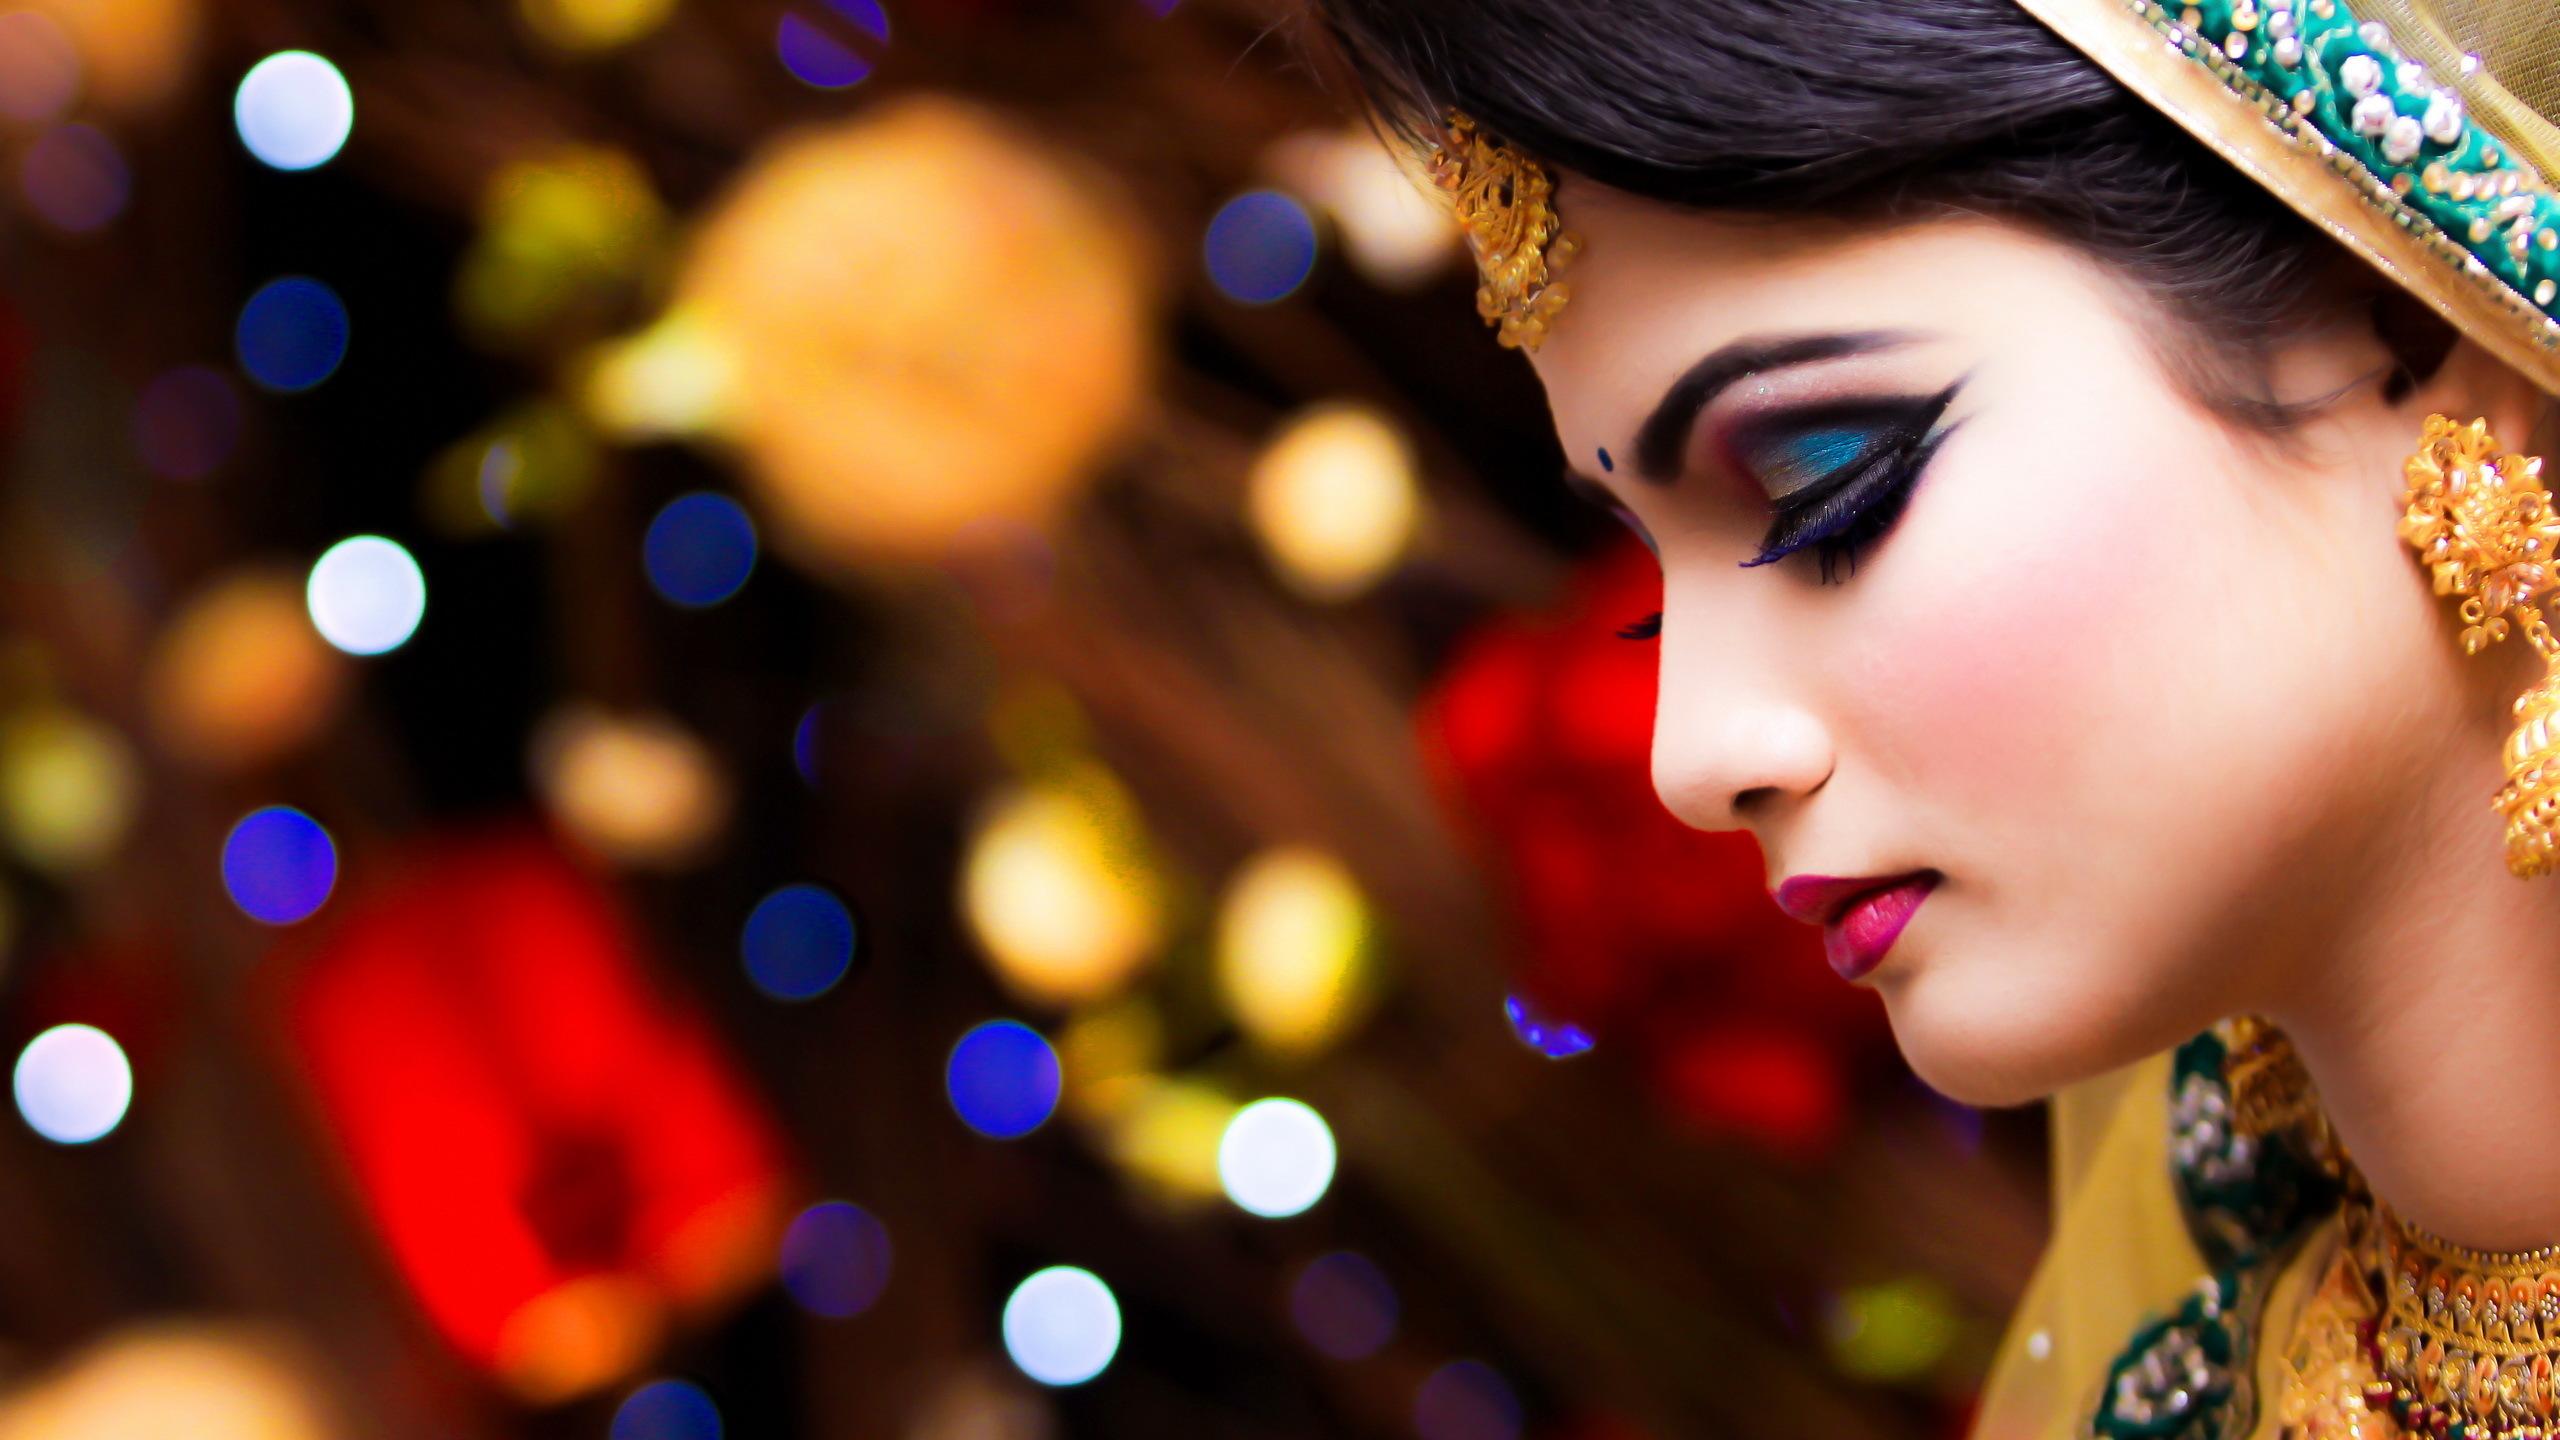 8ba1580d5368 ... Wedding Dress Woman Wreath · HD Wallpaper   Background Image ID:591240